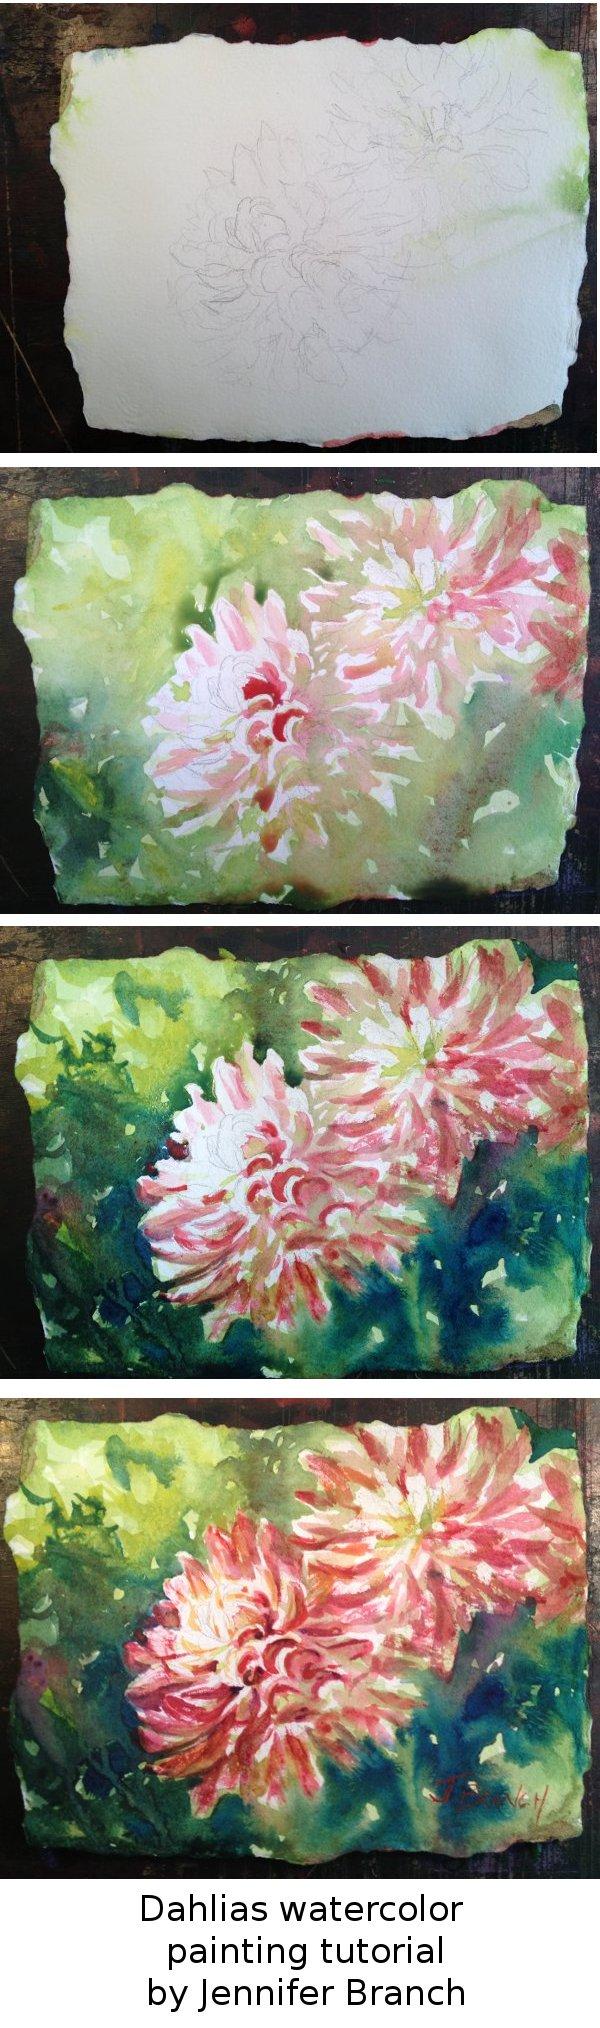 Dahlia Watercolor Painting Tutorial